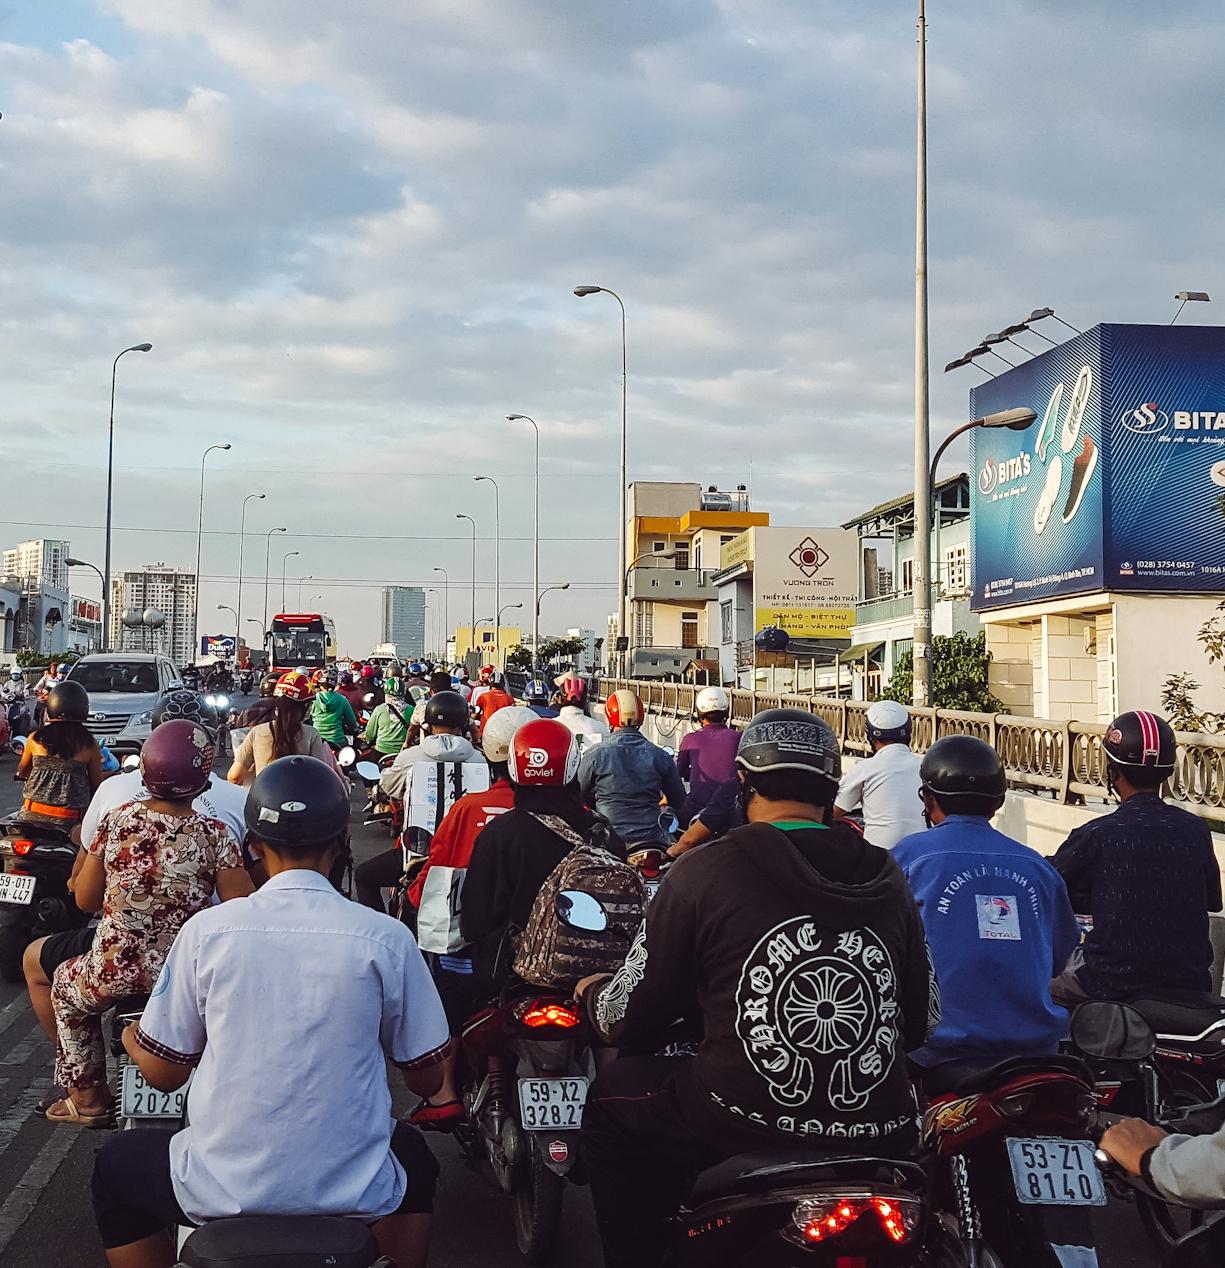 motorcycles Ho Chi Minh City Vietnam